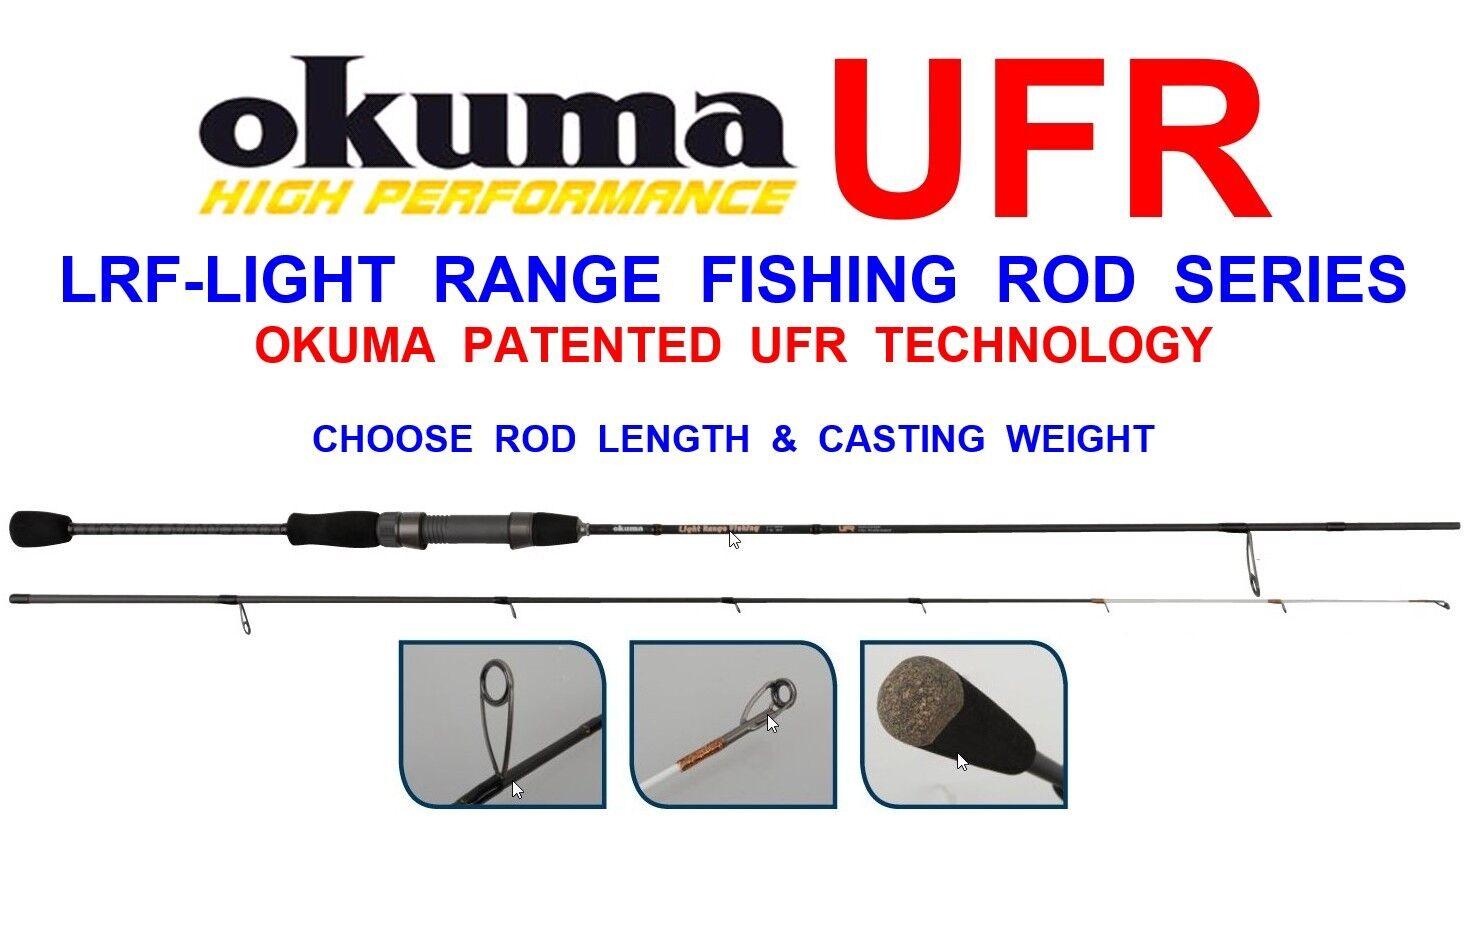 OKUMA LRF UFR LIGHT RANGE 2pc FISHING ROD 24T CARBON FOR GAME SEA SPIN SPINNING